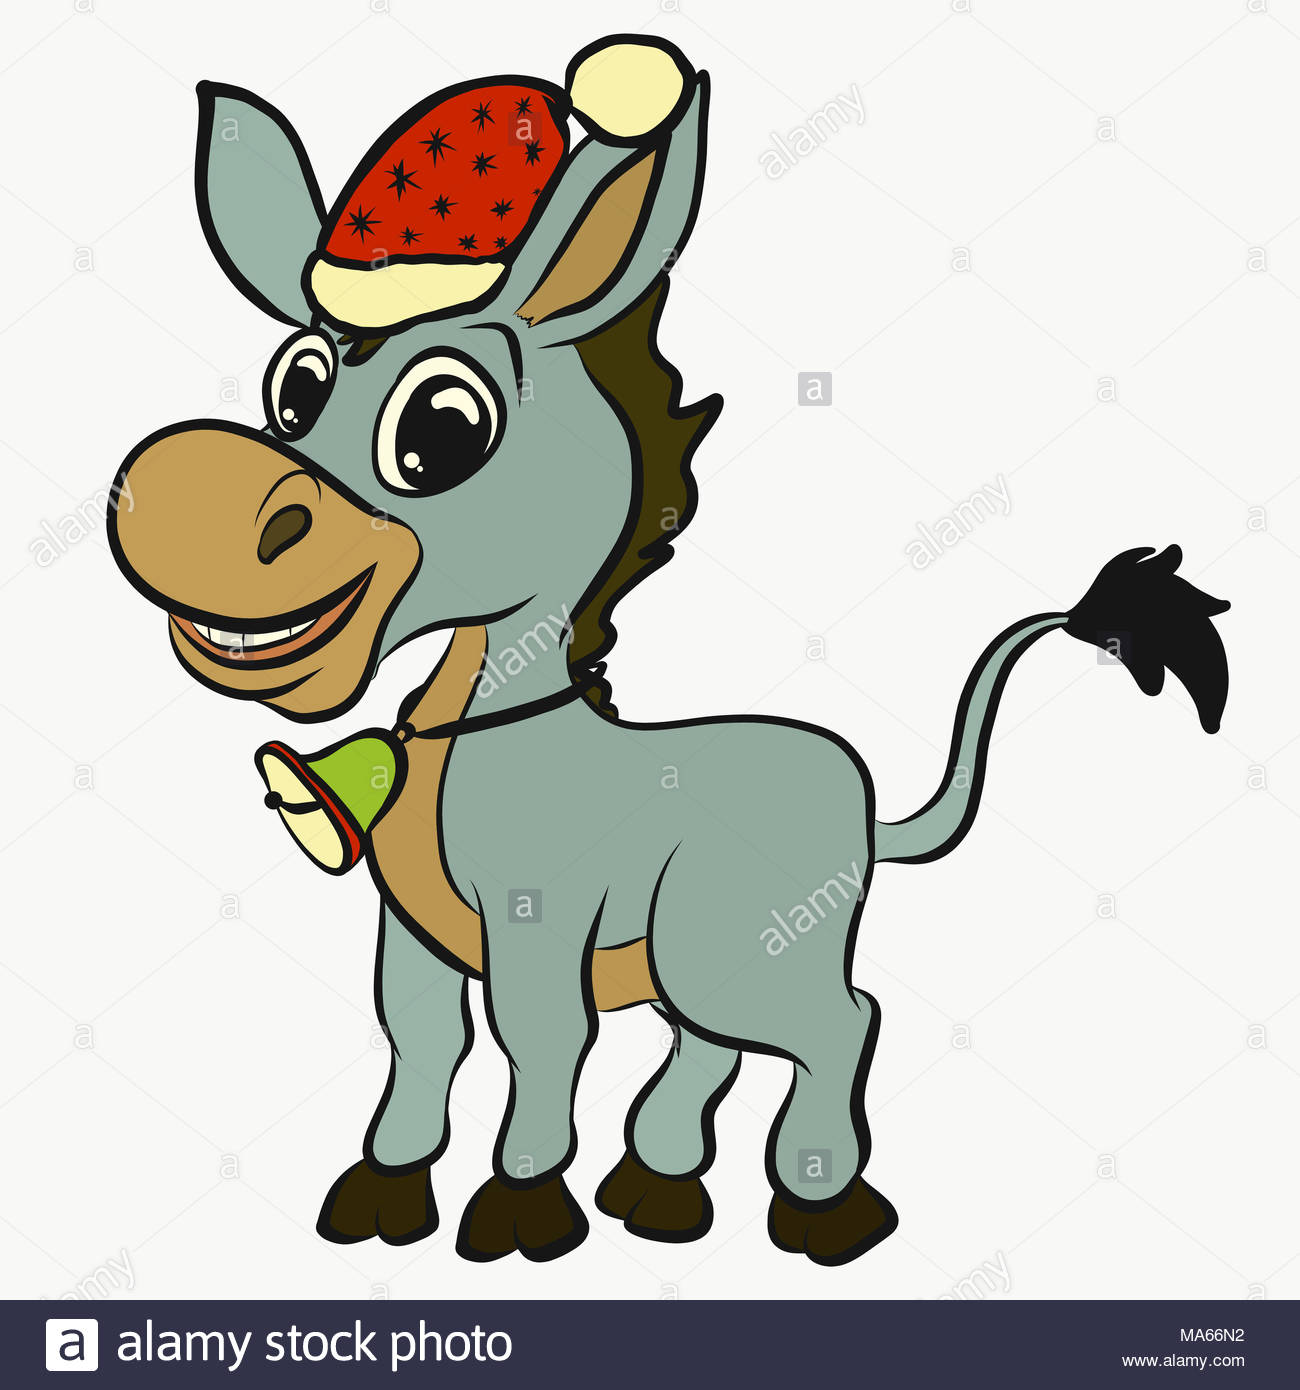 Weihnachten Funny.Cheerful Funny Donkey Celebrating Christmas Stock Photo 178387246